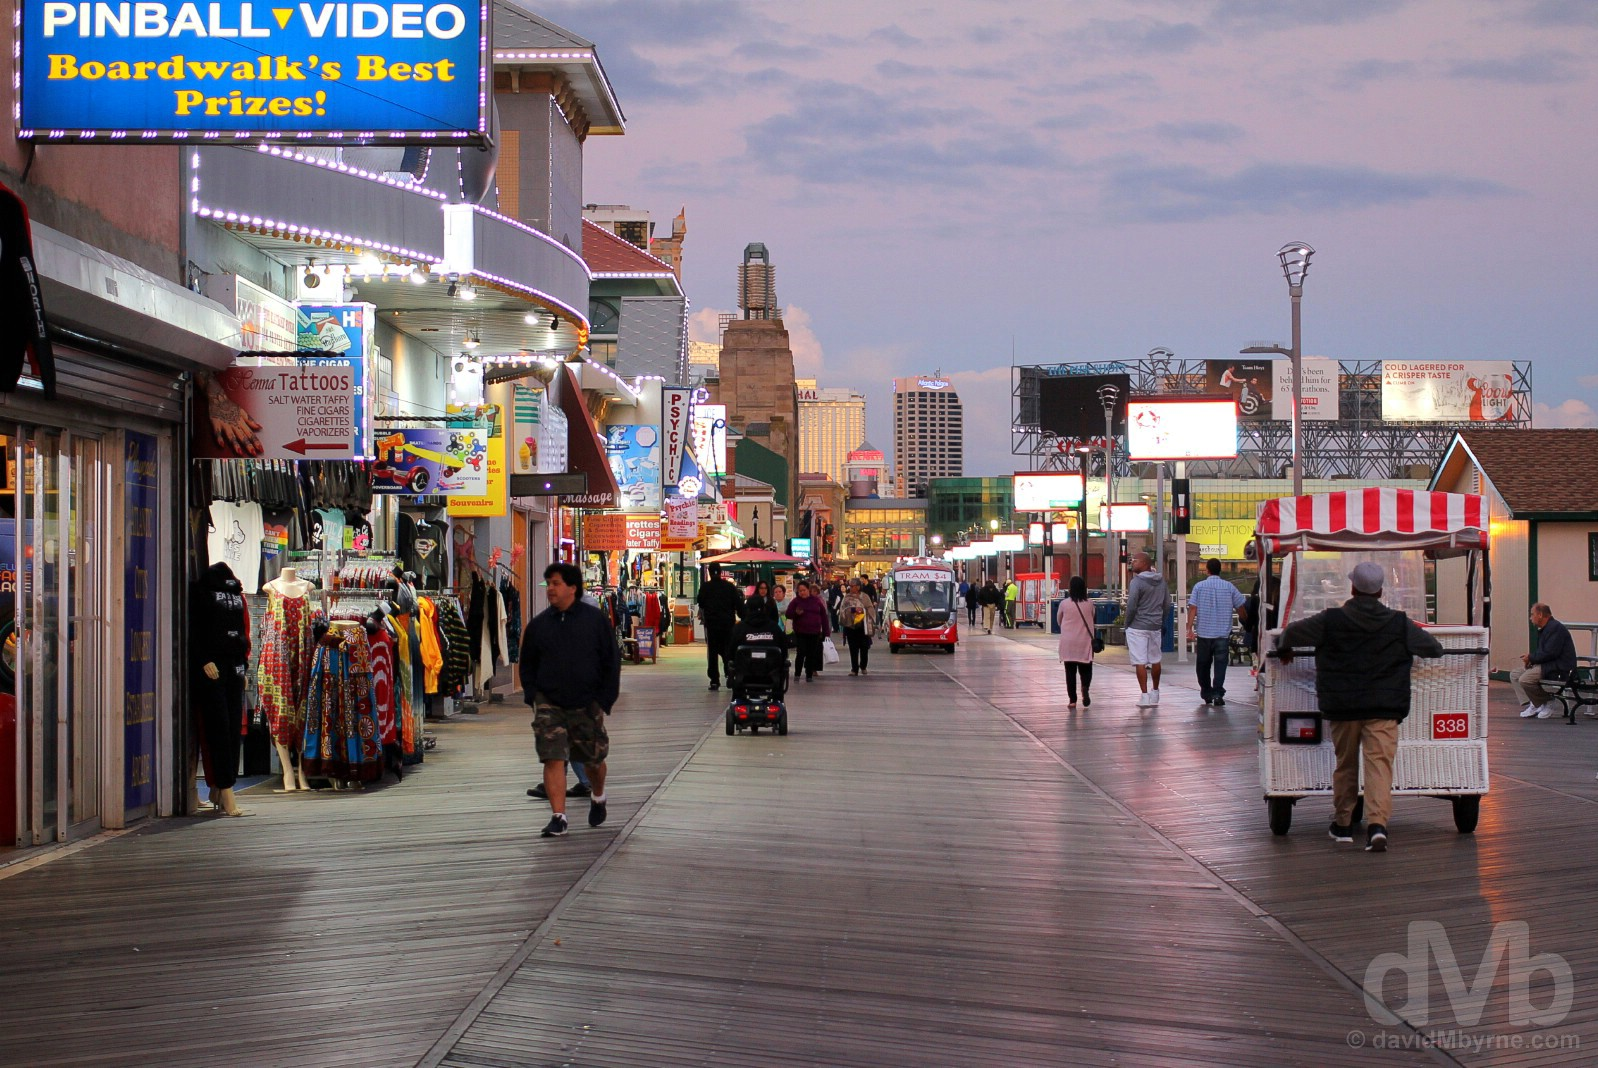 The Boardwalk. Atlantic City, New Jersey, USA. September 30, 2017.